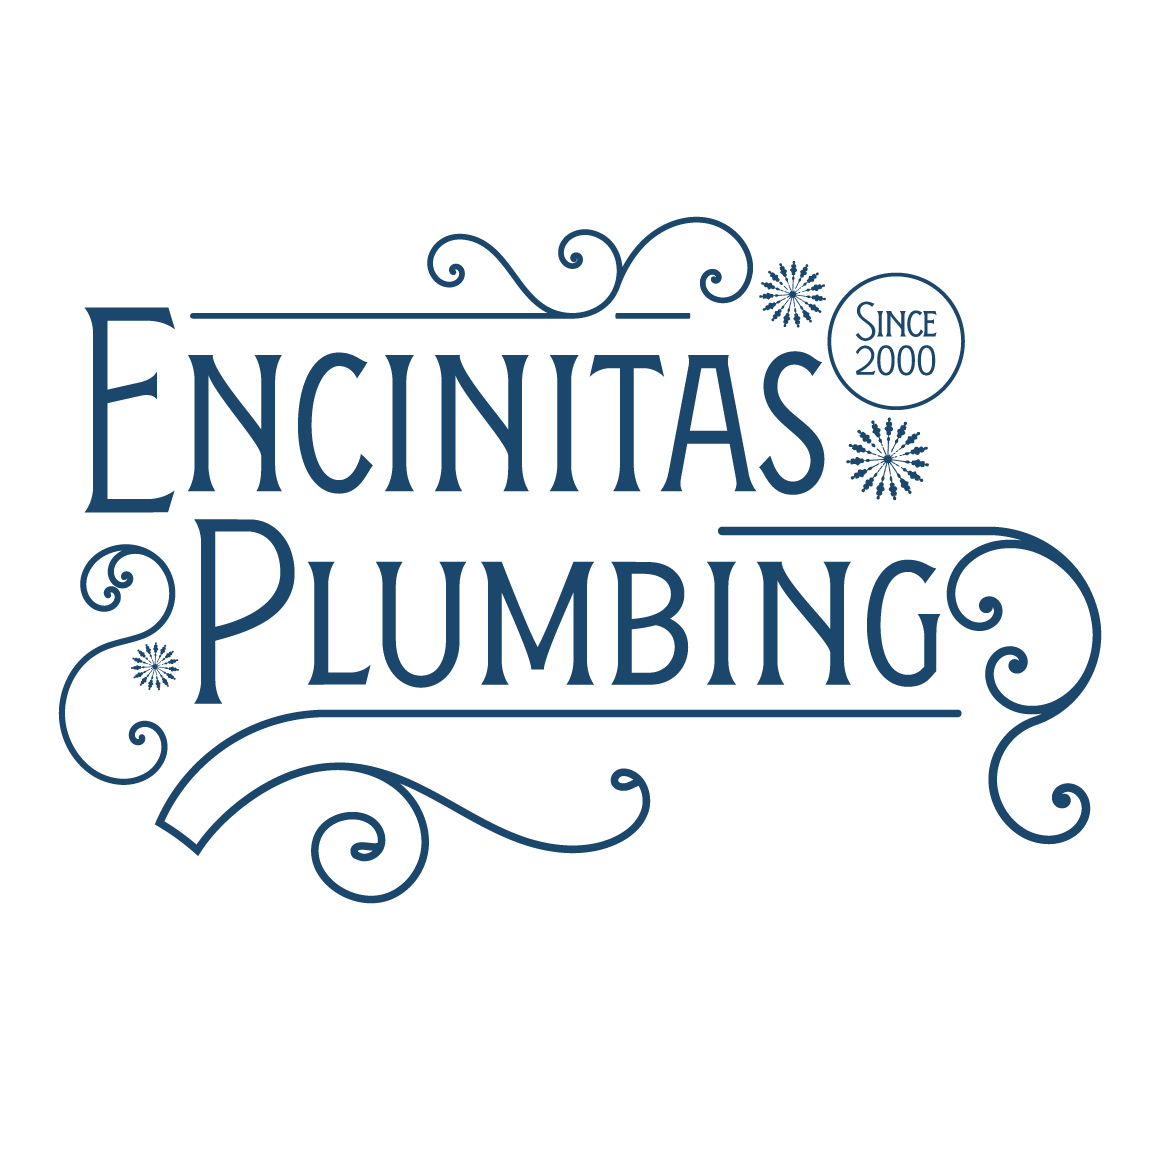 Encinitas Plumbing